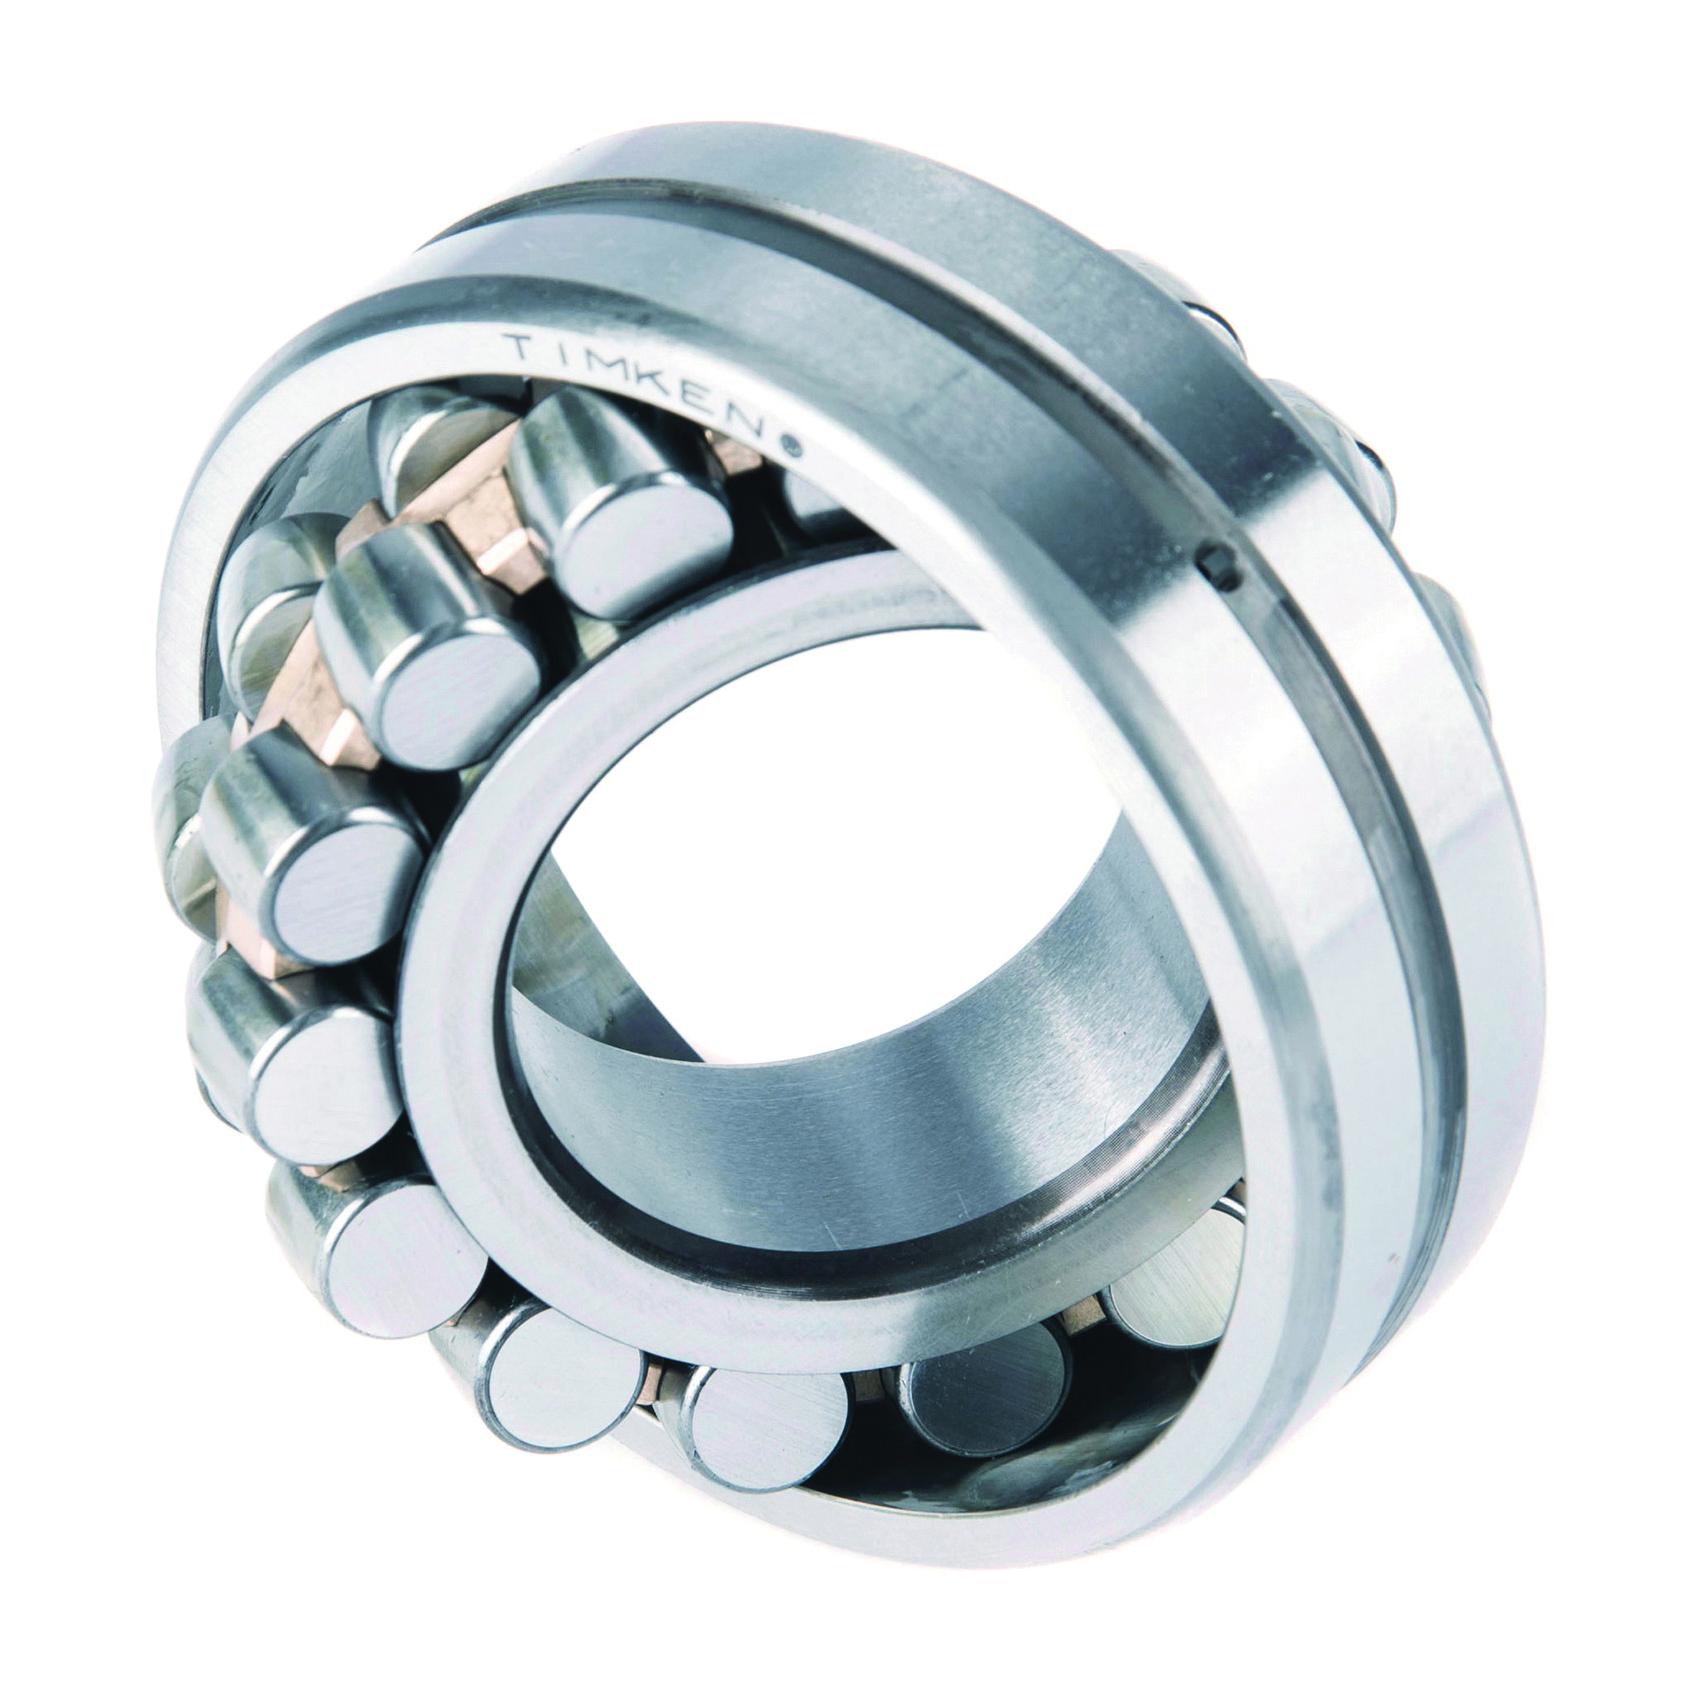 Timken® 23980EMBW509C08C3